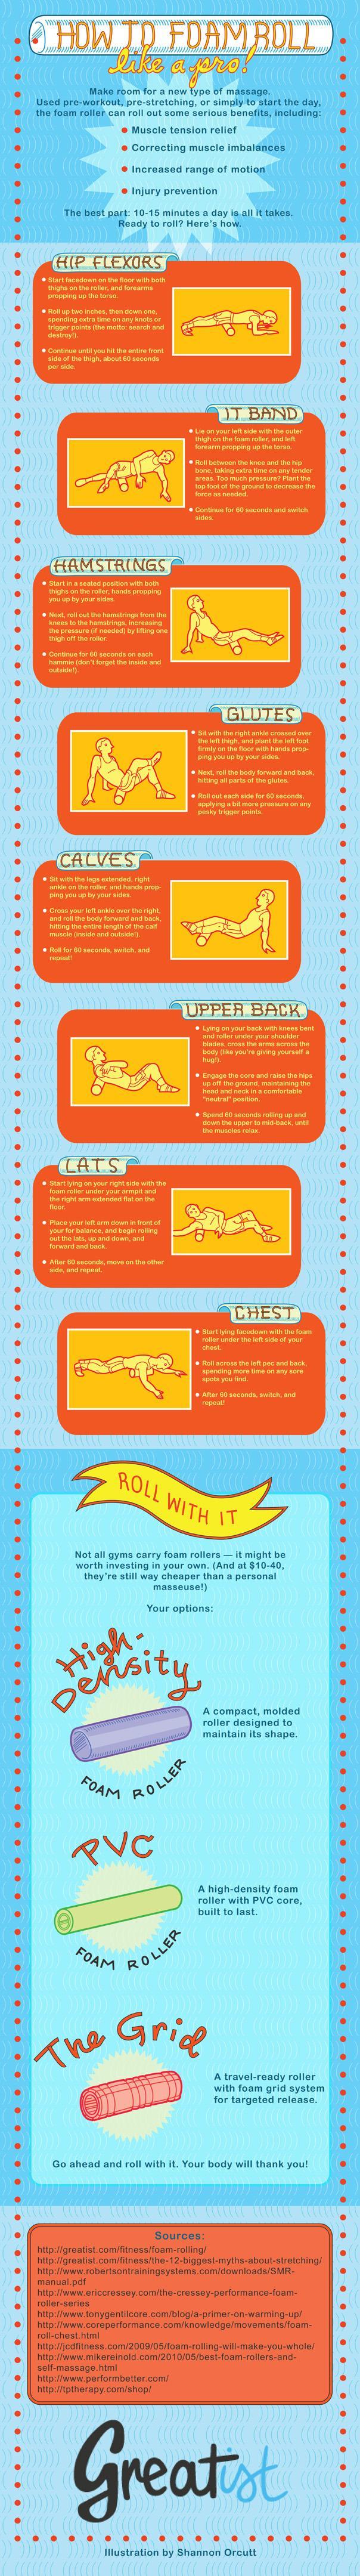 Foam-Rolling-Infographic